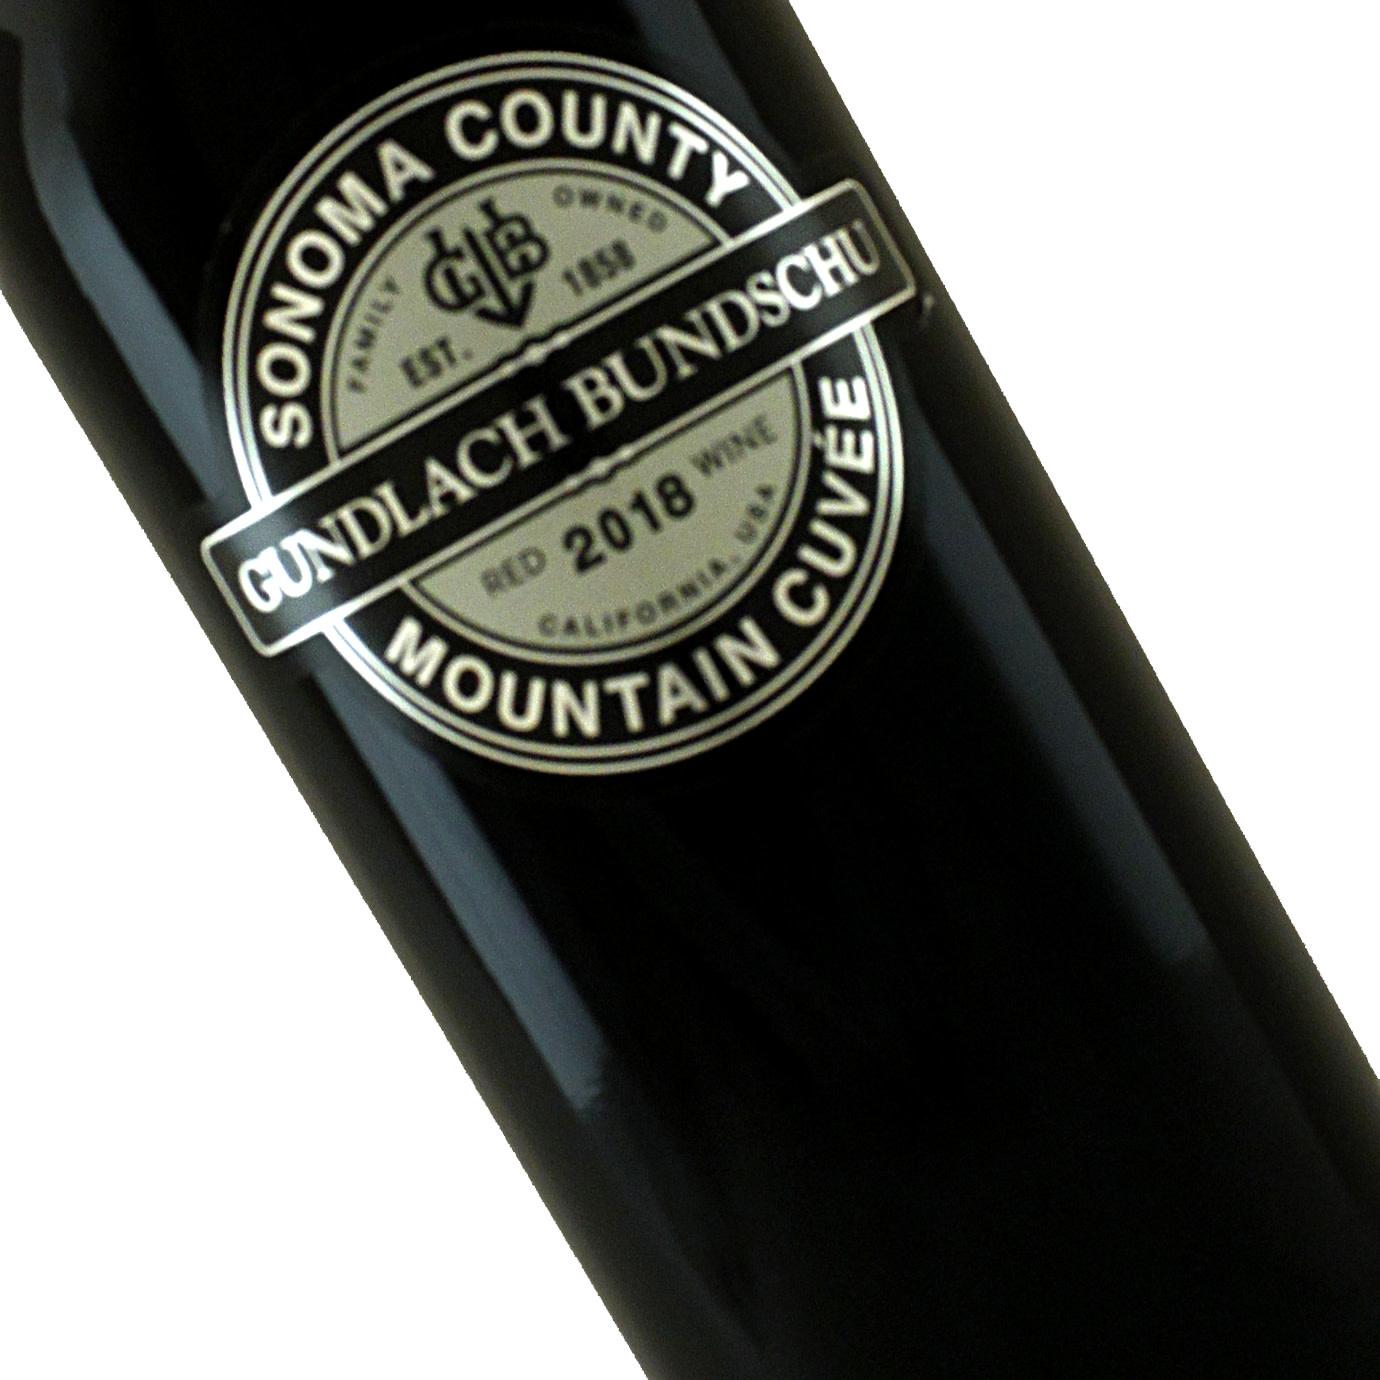 Gundlach Bundschu 2018 Mountain Cuvee Sonoma County